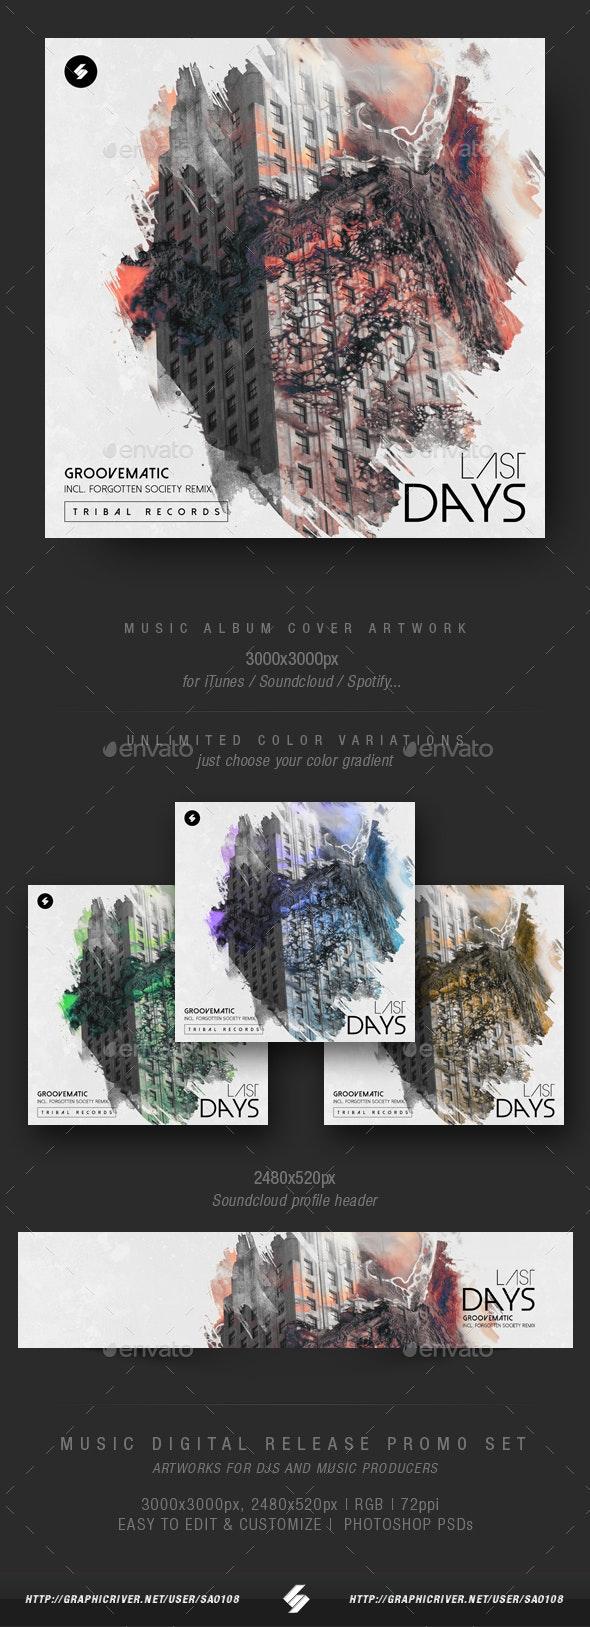 Last Days - Music Album Cover Artwork Template - Miscellaneous Social Media